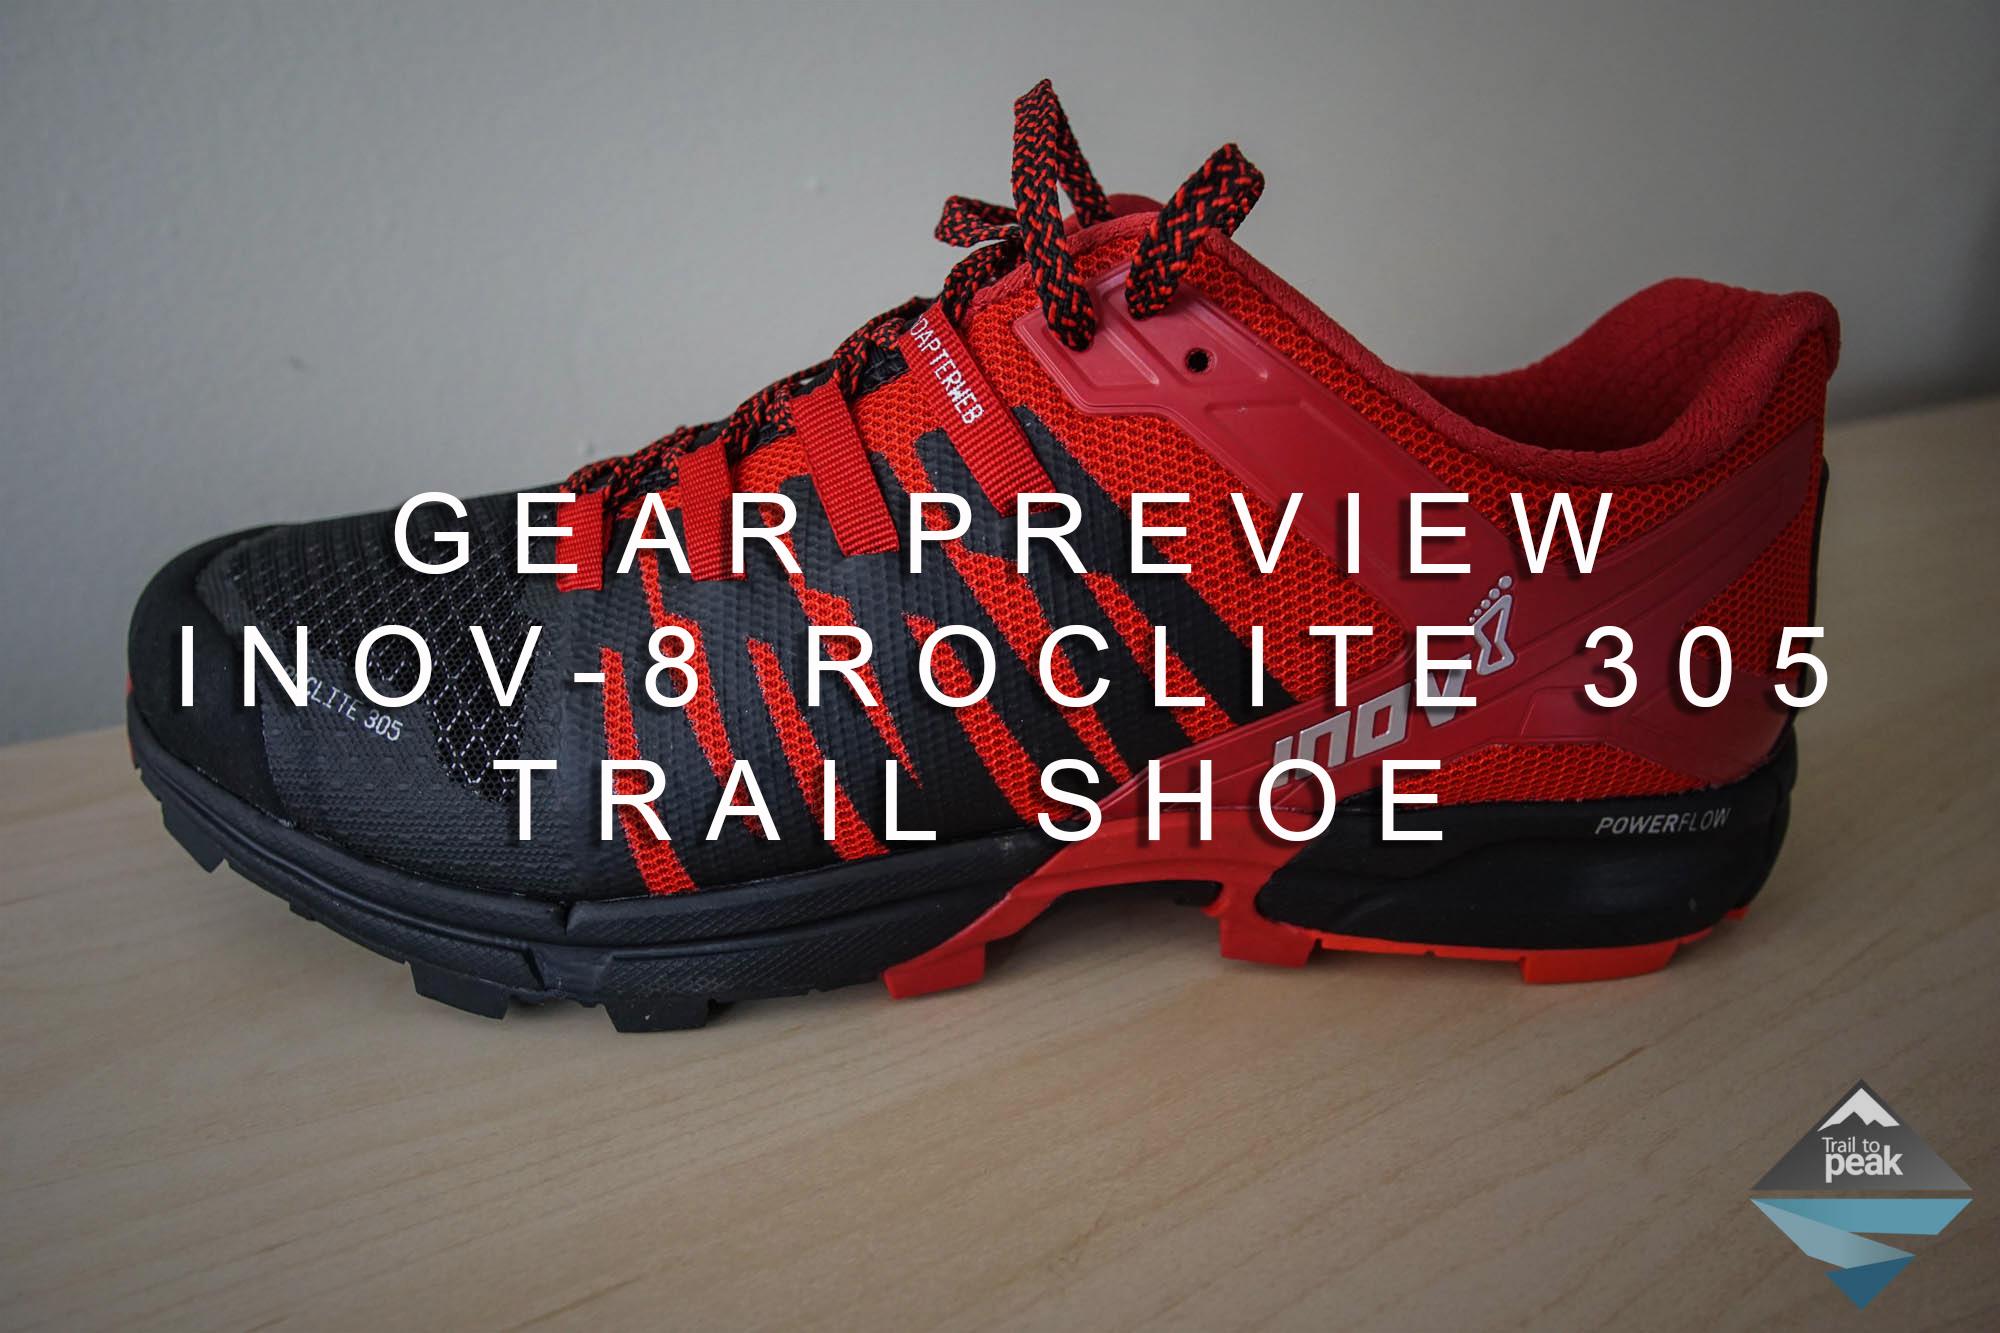 new style e53fd 576d6 Gear Preview: Inov-8 Roclite 305 Trail Shoe - Trail to Peak